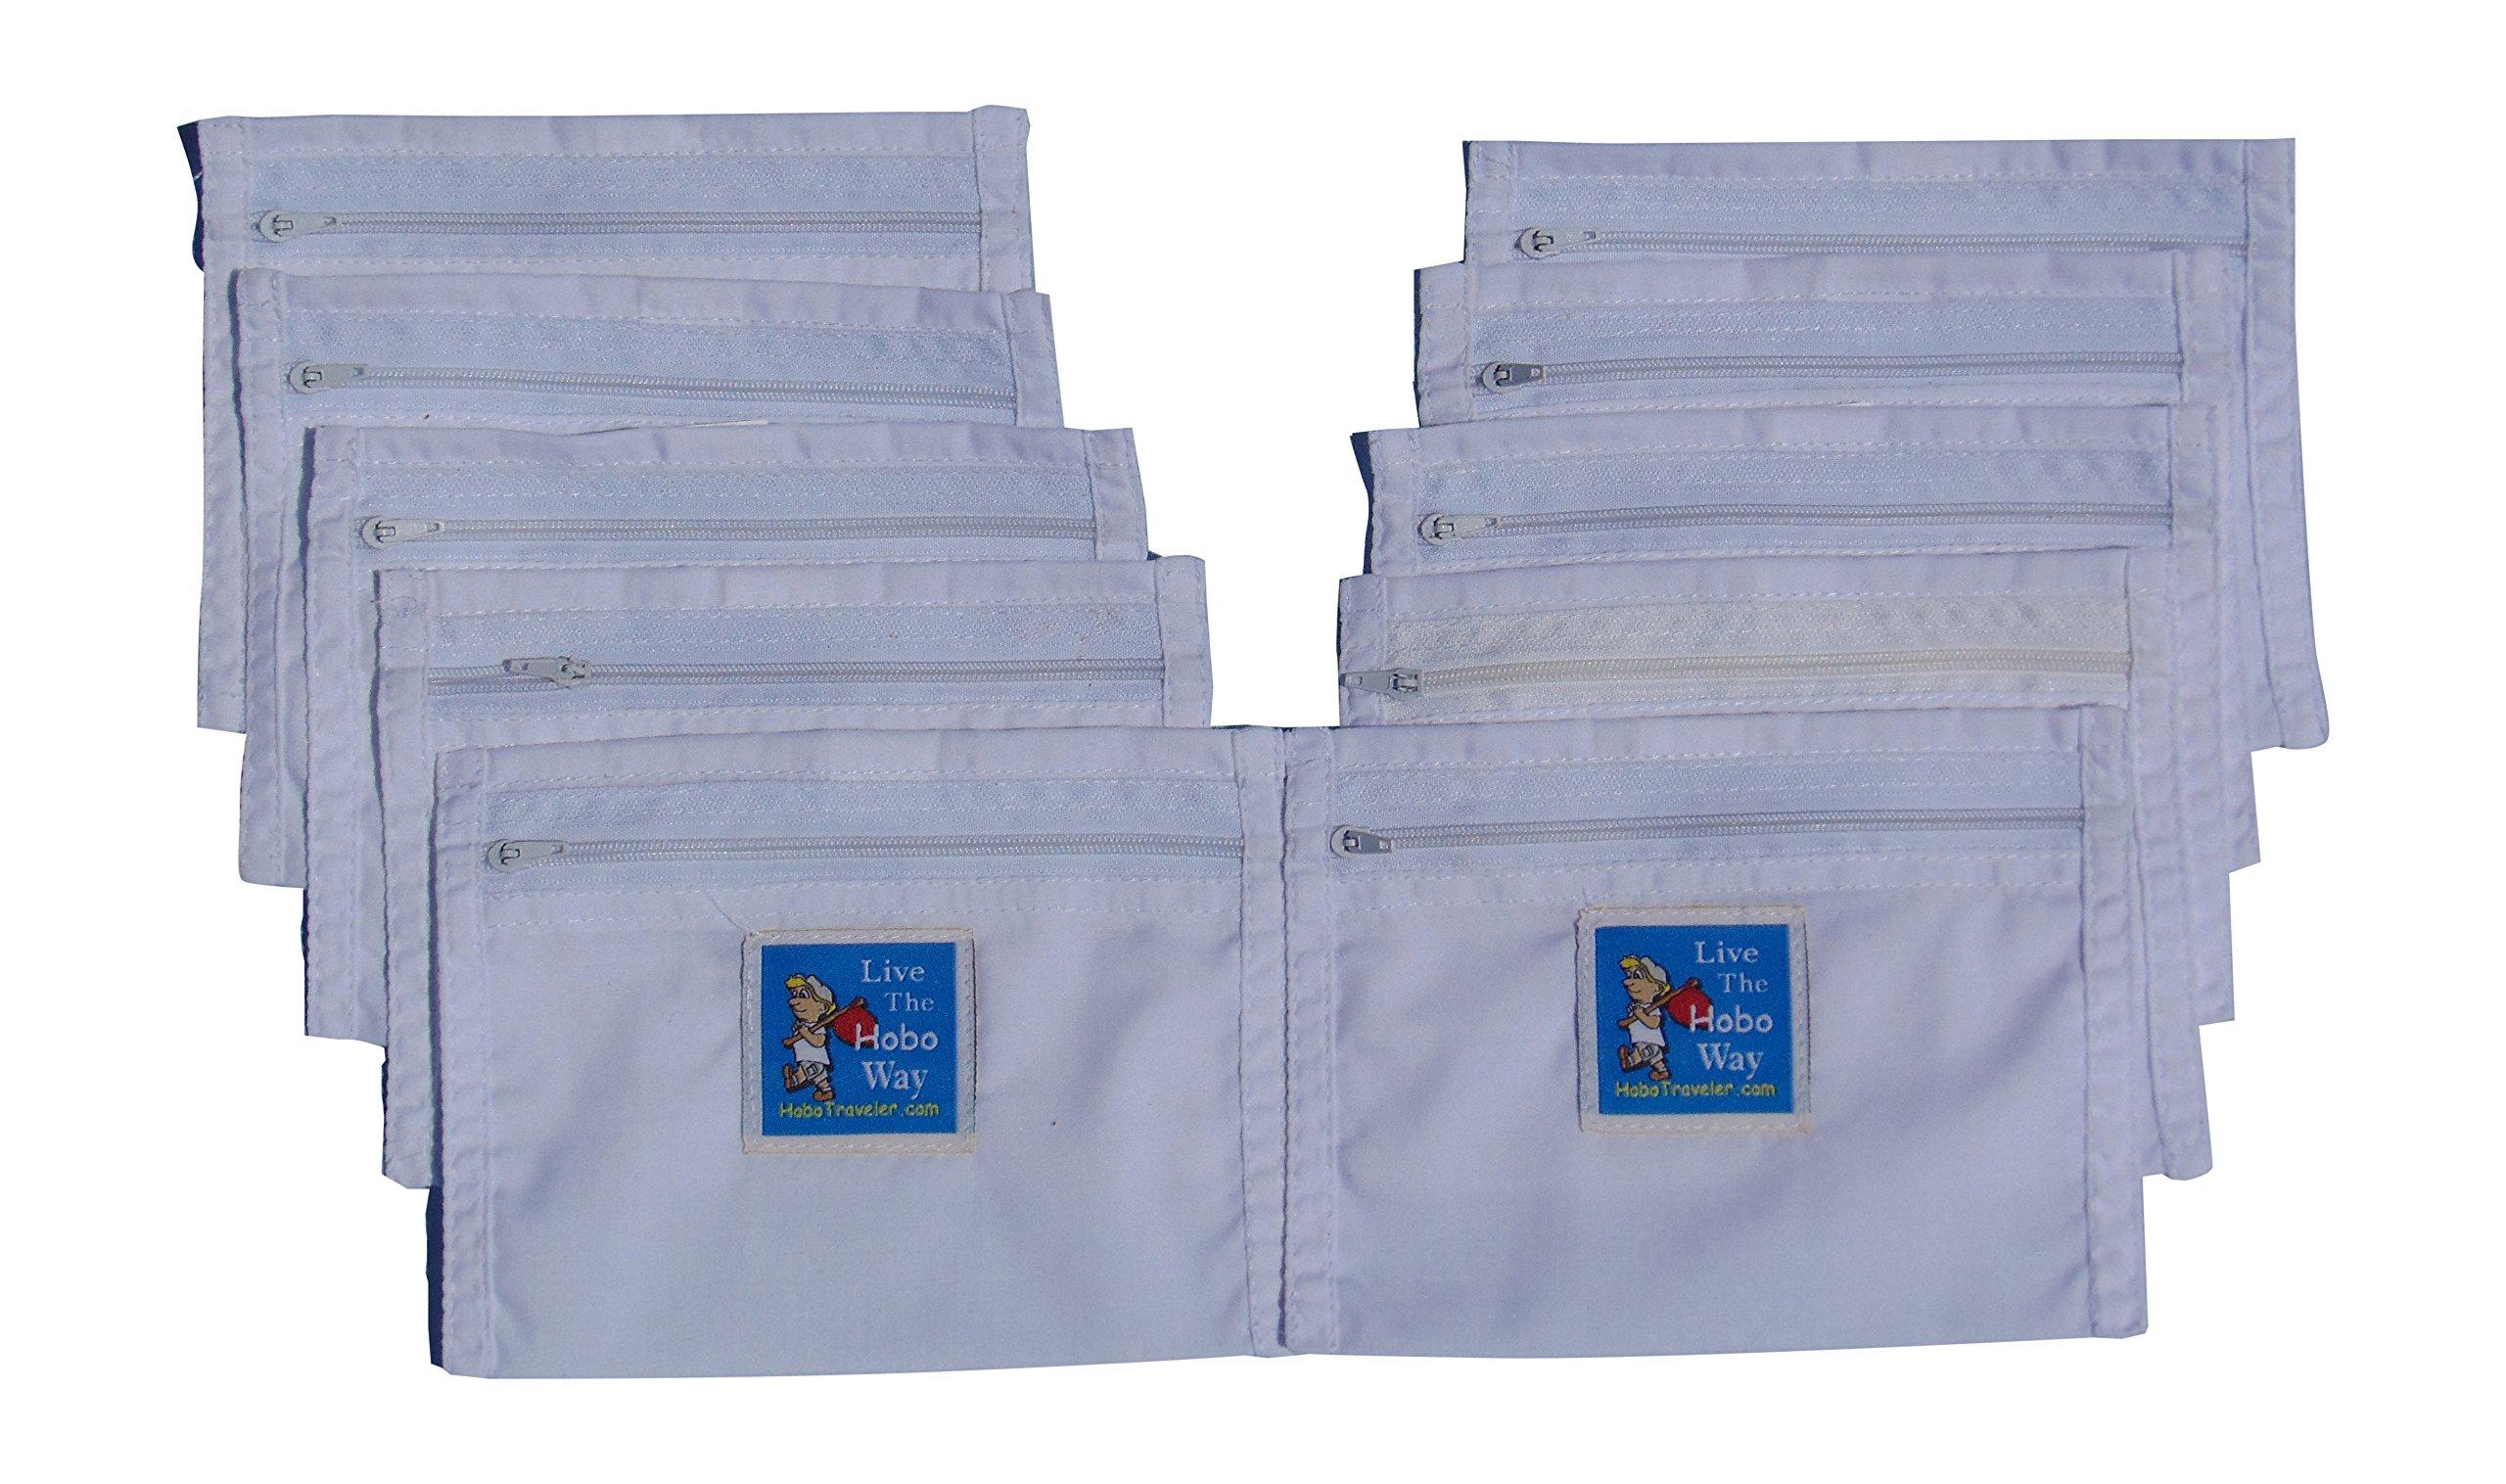 HoboTraveler.com 10 Secret Money Pockets Zipper Passport Size Ready to Sew Into Clothing